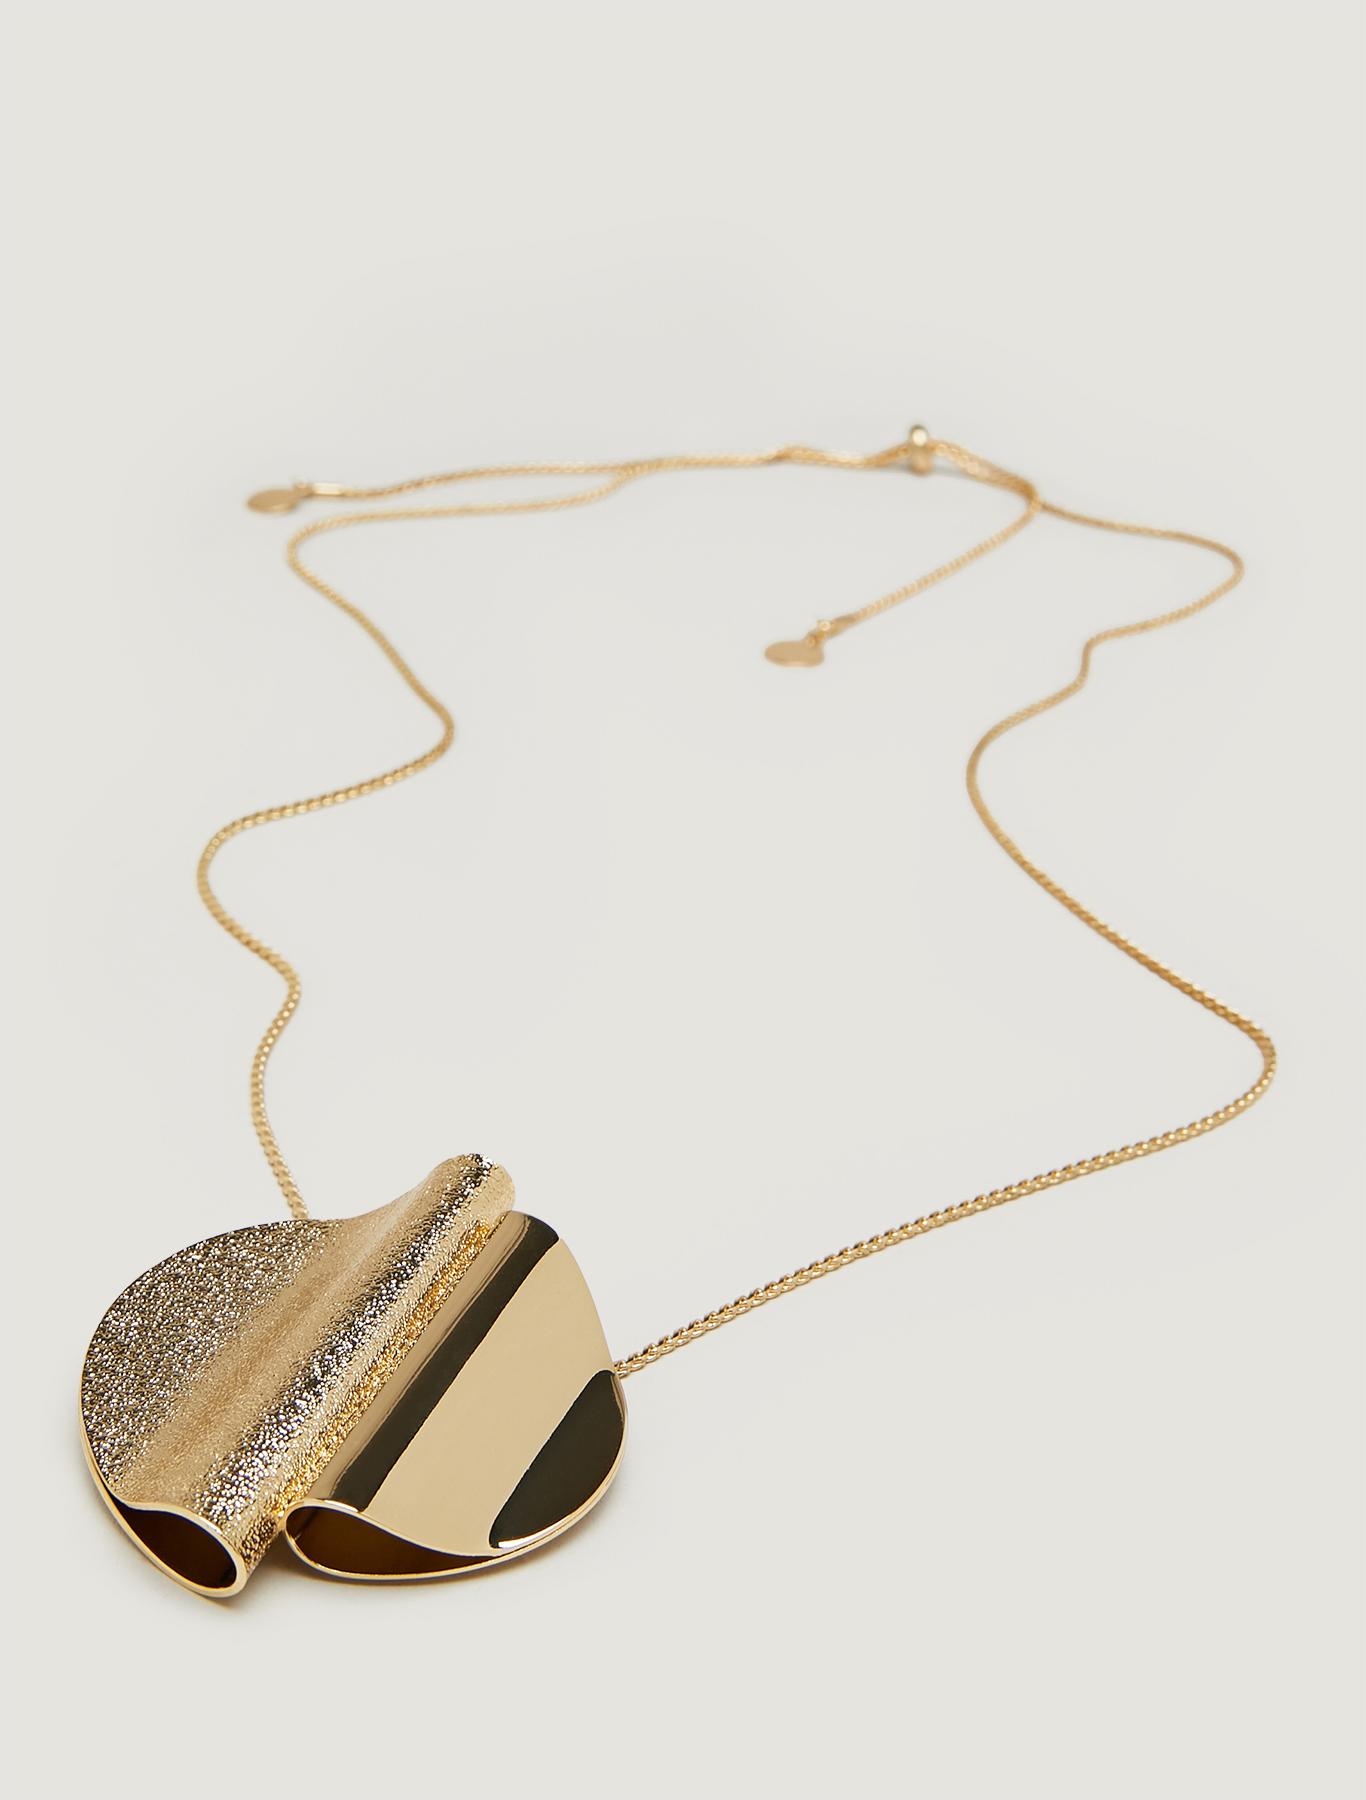 Sculpture pendant necklace - gold - pennyblack